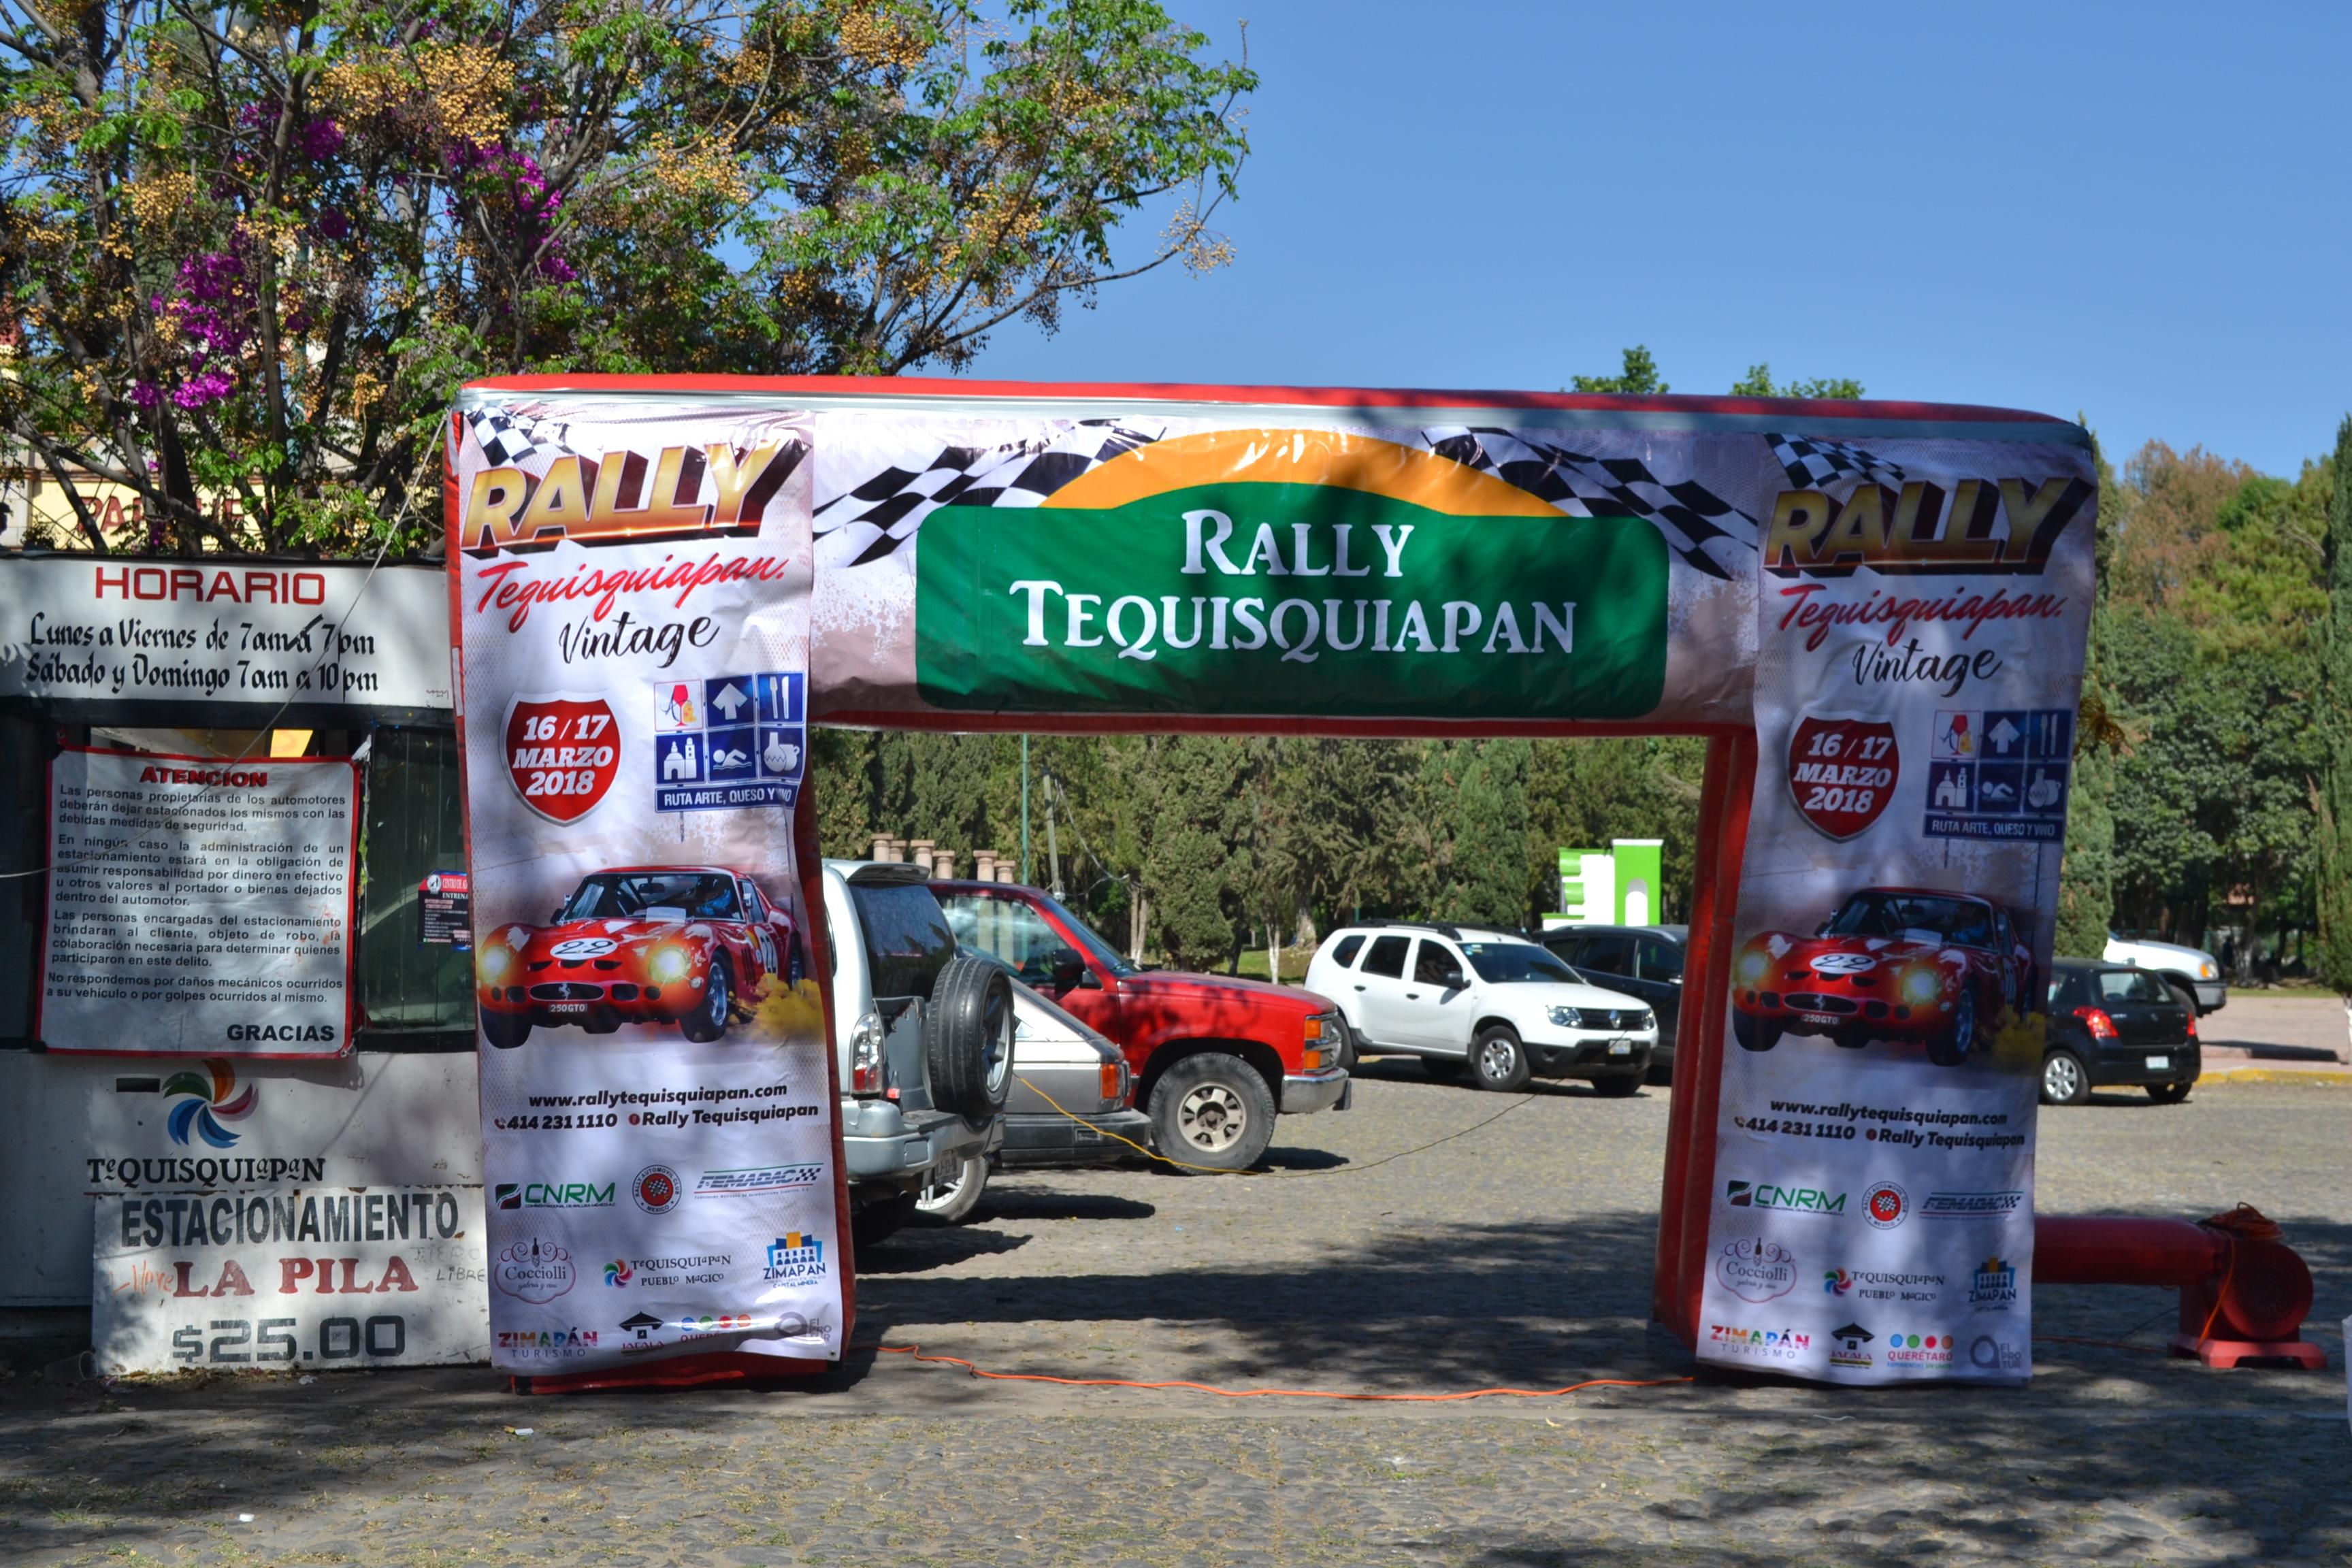 Rally Tequiasquiapan Vintage 2018 009